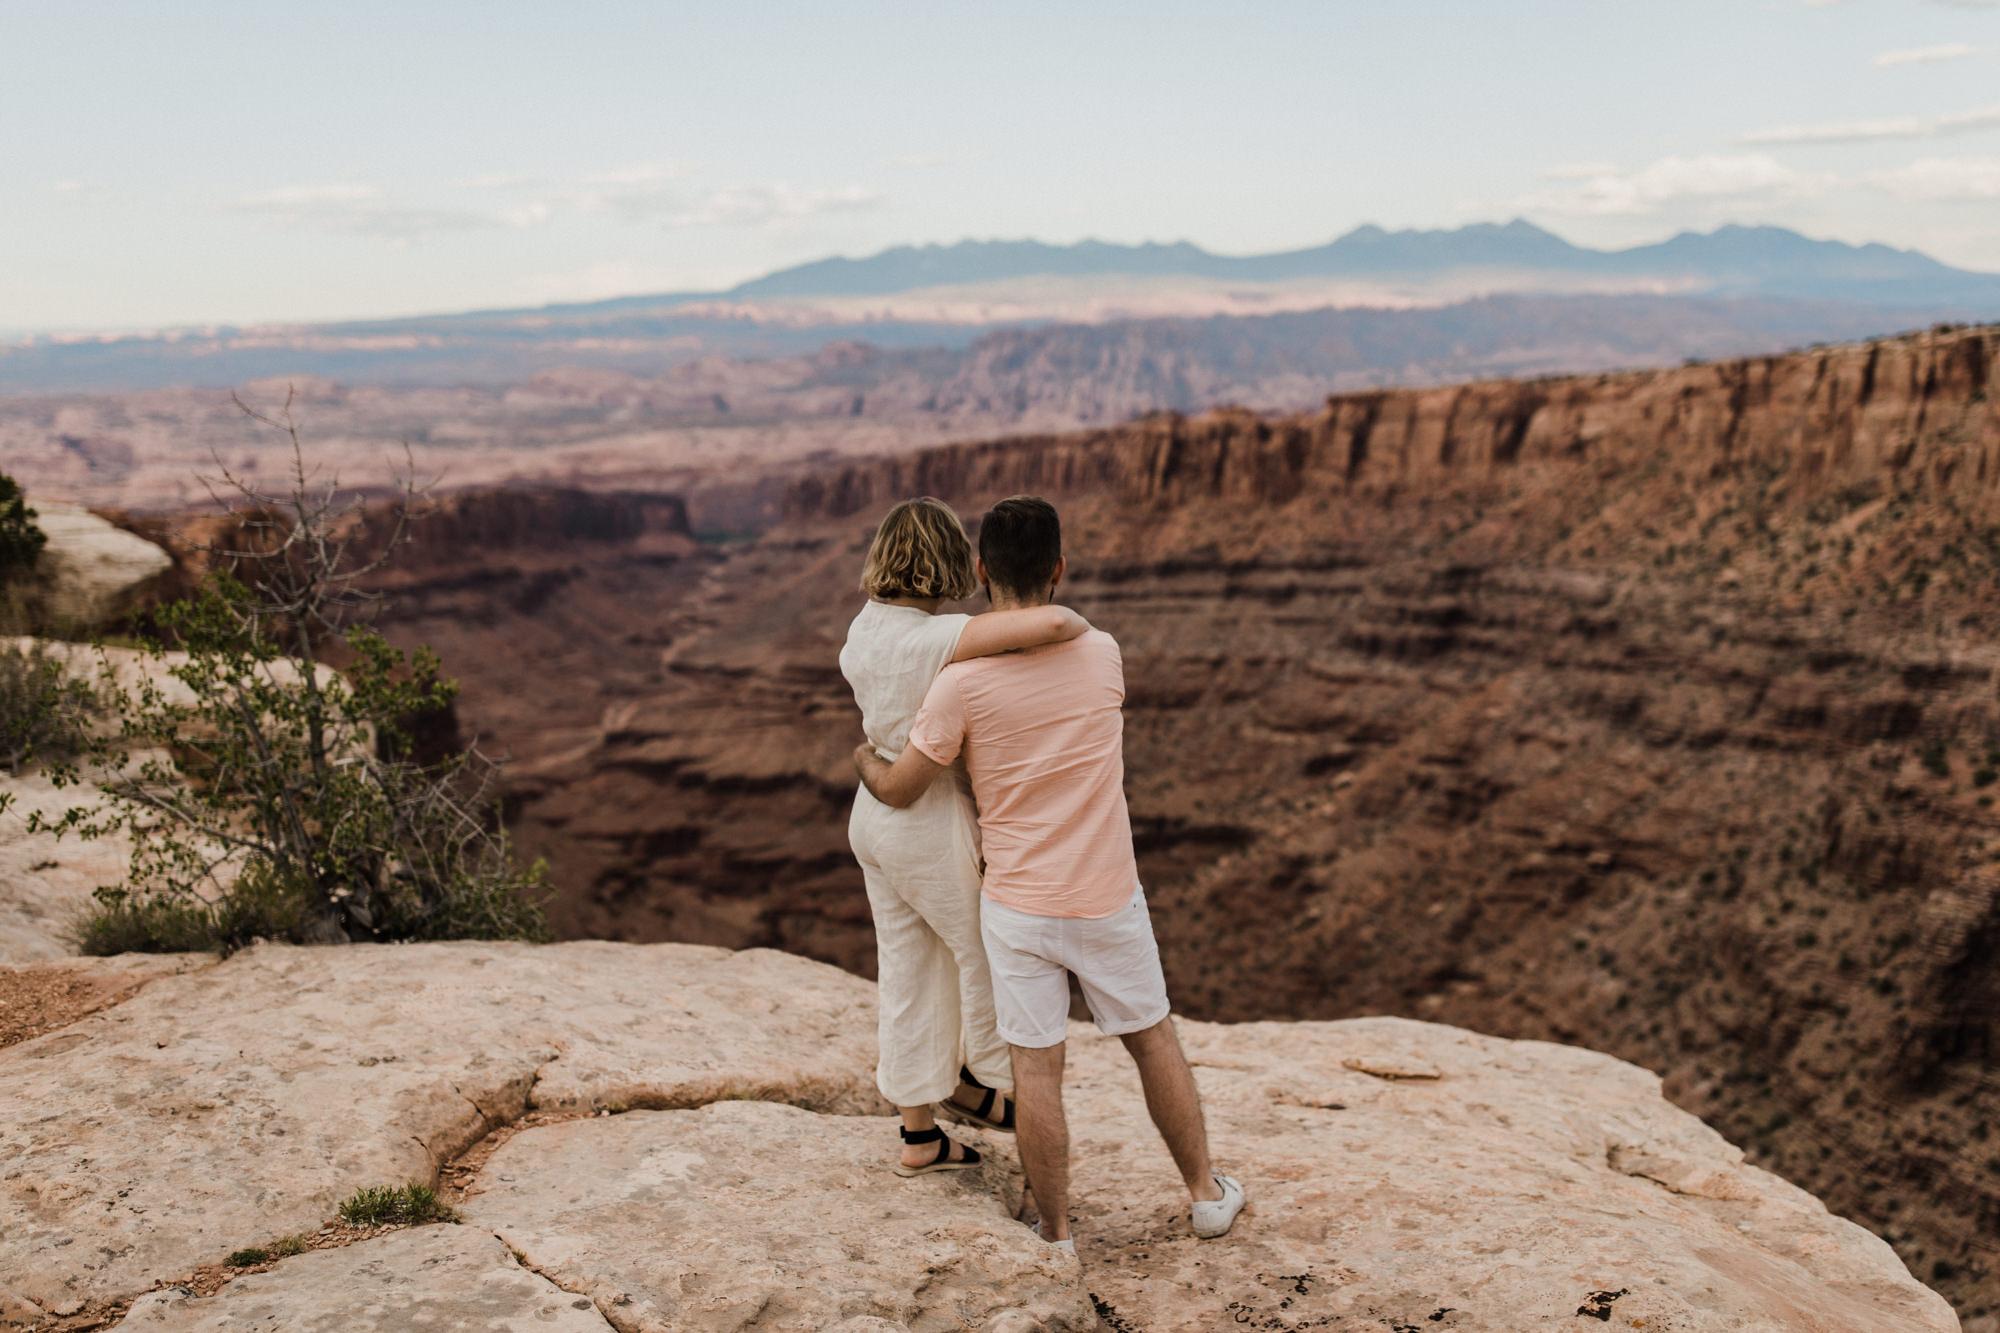 moab utah adventure elopement session | destination engagement photo inspiration | utah adventure elopement photographers | the hearnes adventure photography | www.thehearnes.com